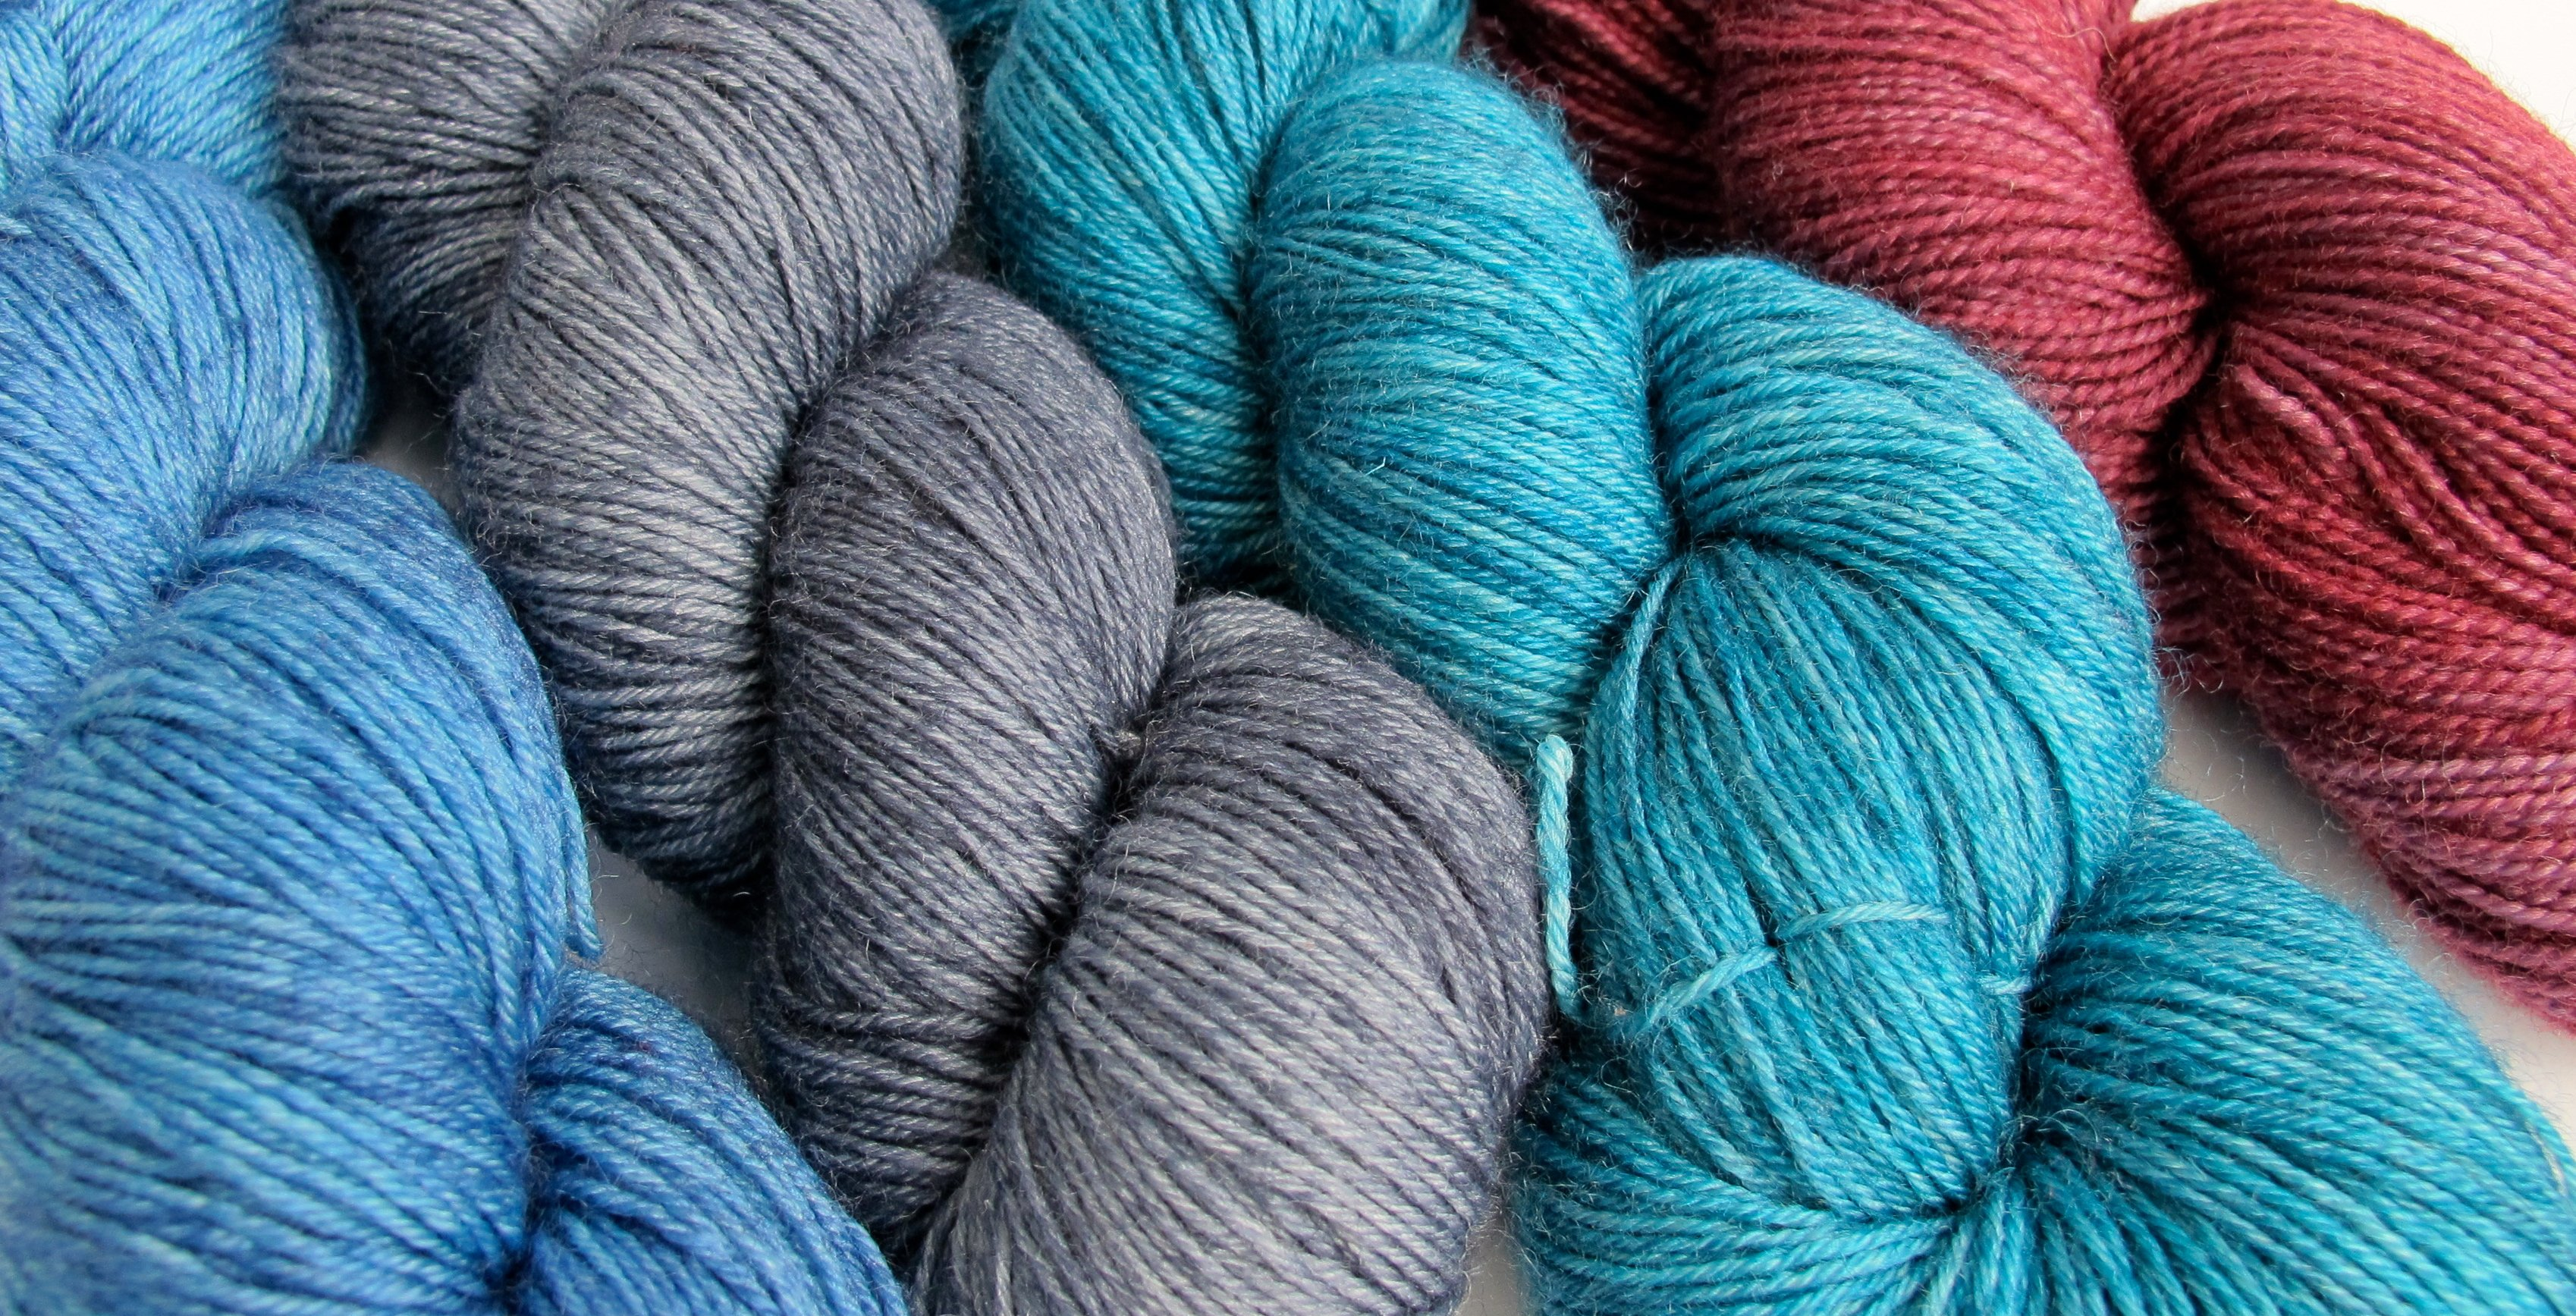 Bernat Big Ball Blanket Yarn - Knitting & Crochet Yarn | JOANN